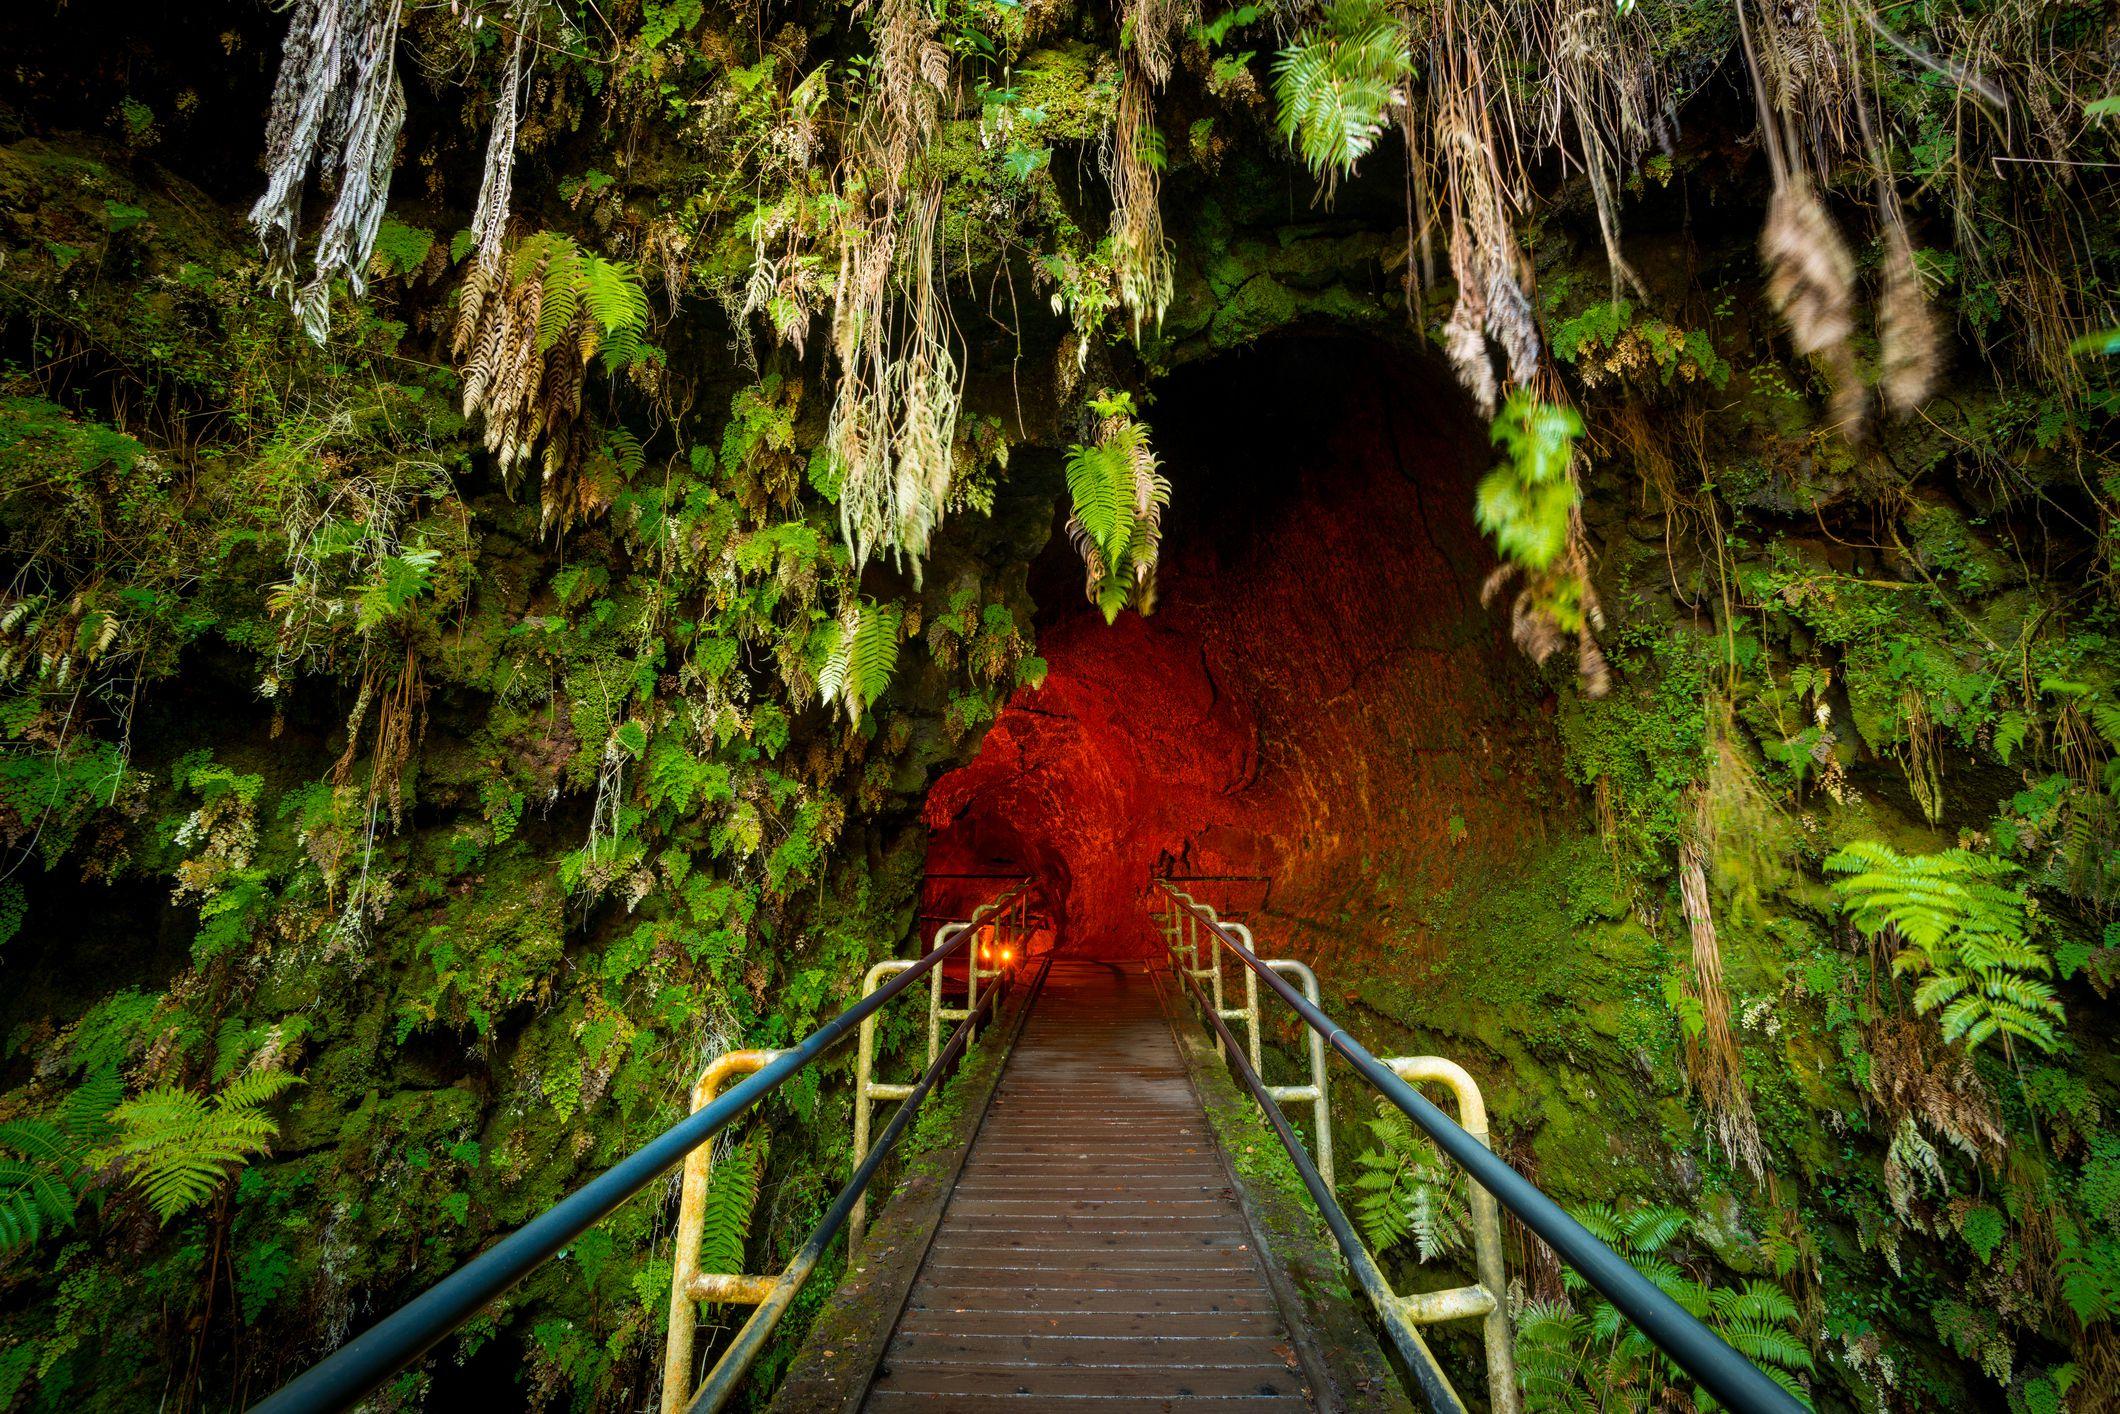 Entrance to the Thurston Lava Tube